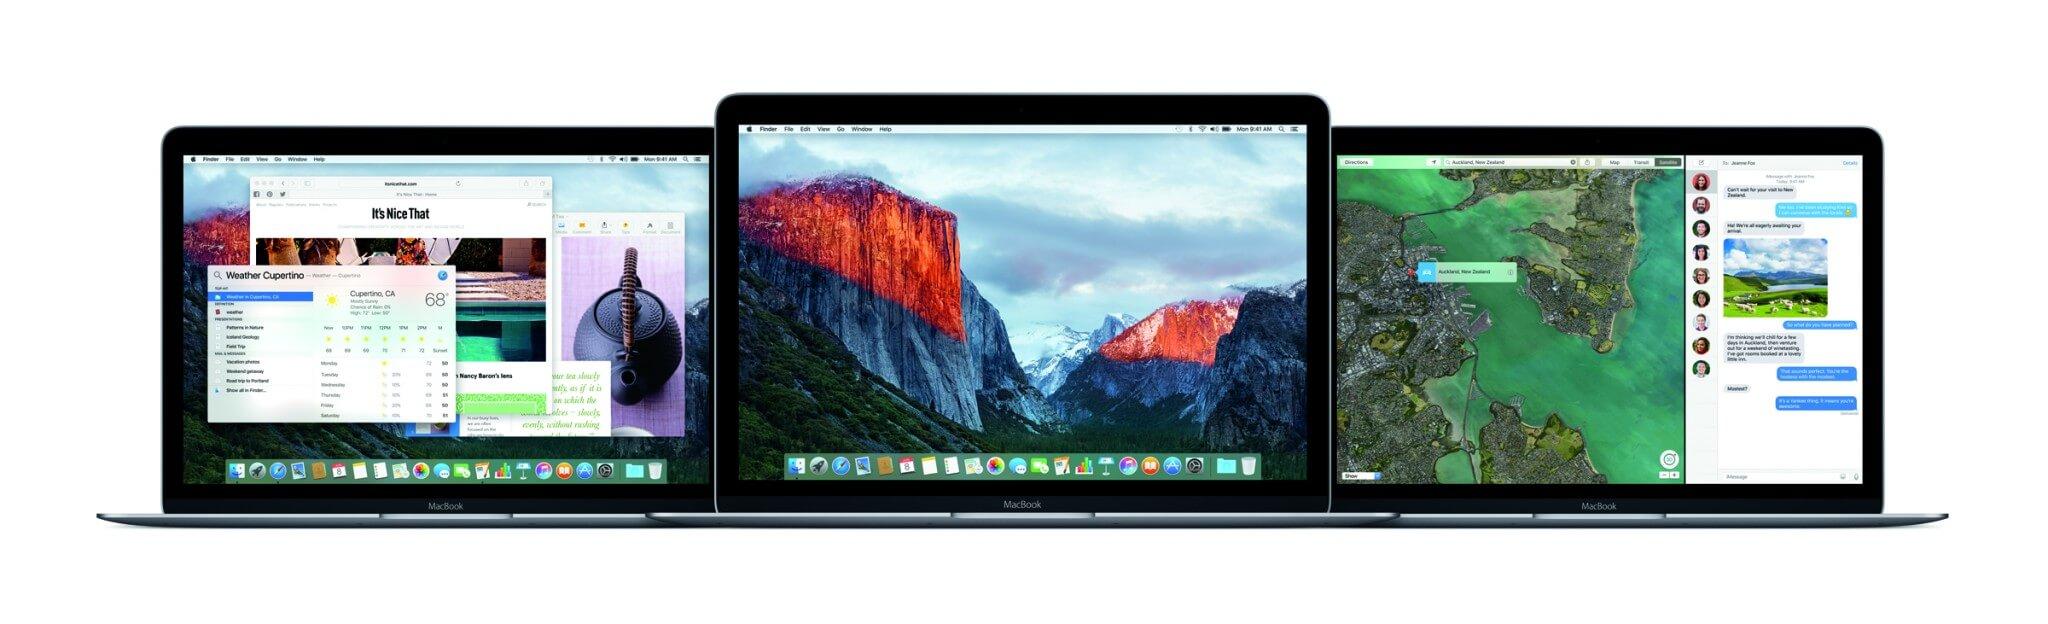 Mac-Betriebssystem OS X 10.11 El Capitan (Bildrechte: Apple)